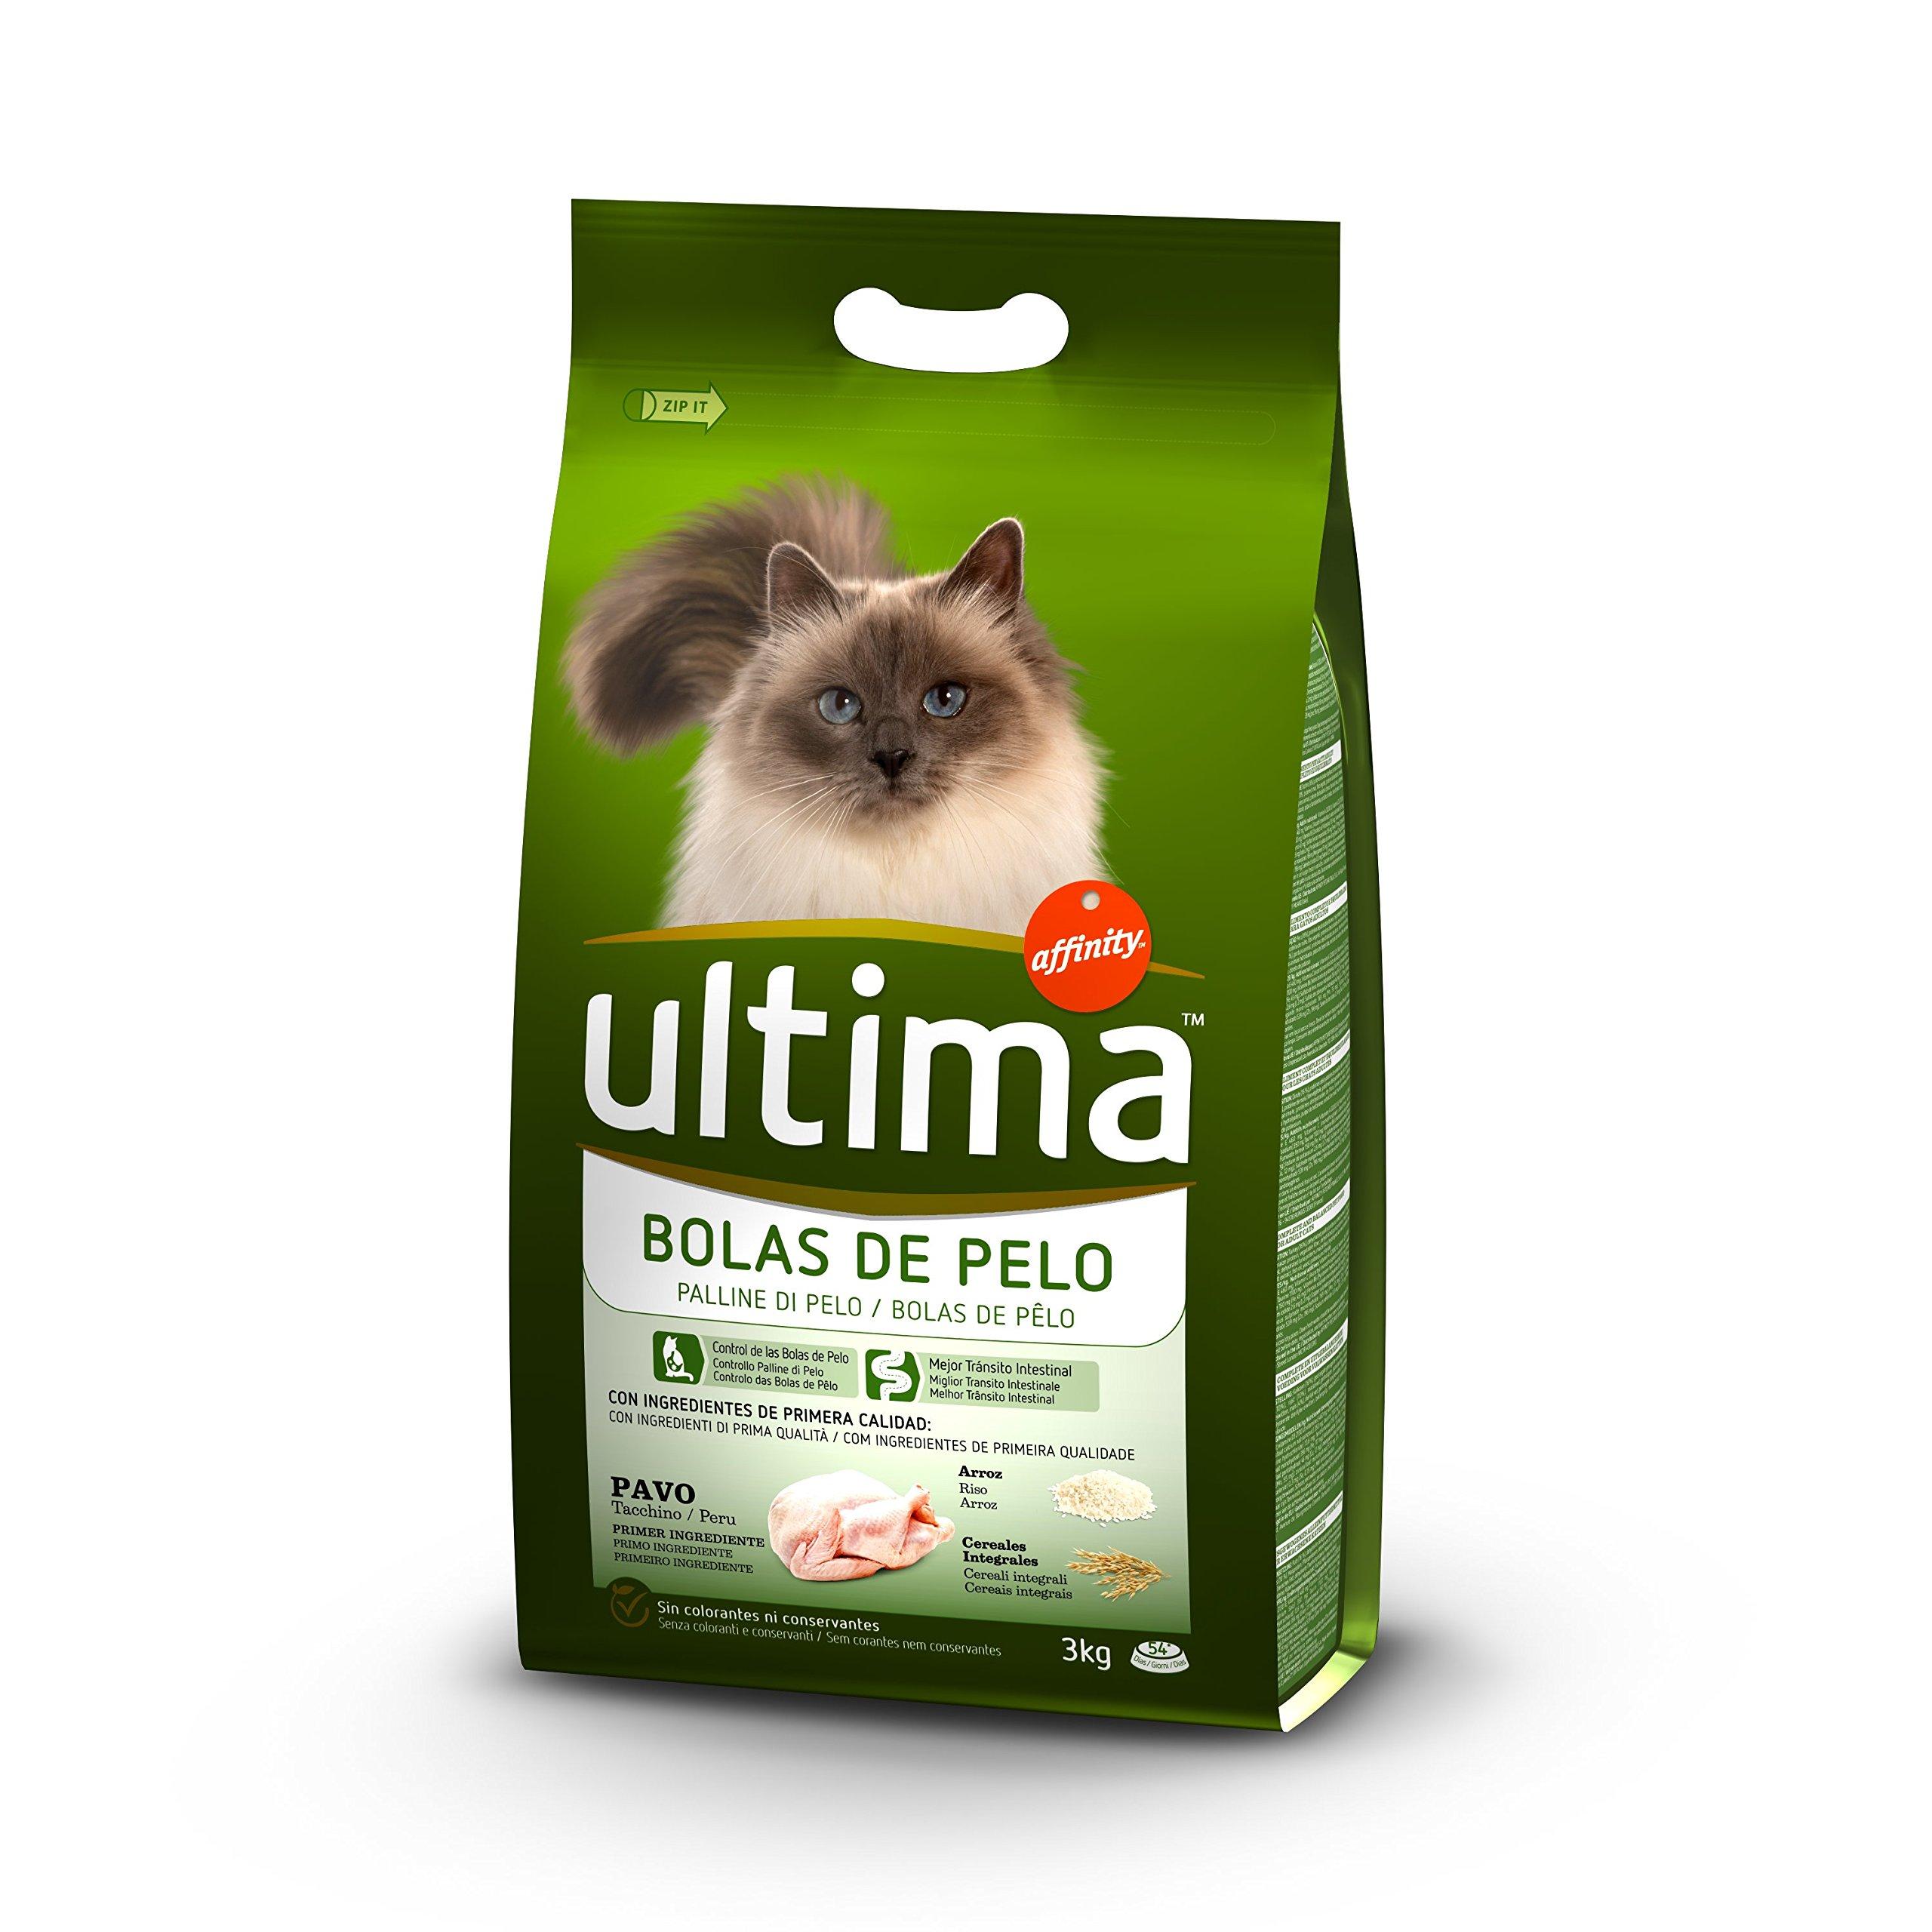 Ultima Pienso para Gatos para prevenir las Bolas de Pelo con Pavo - 3000 gr product